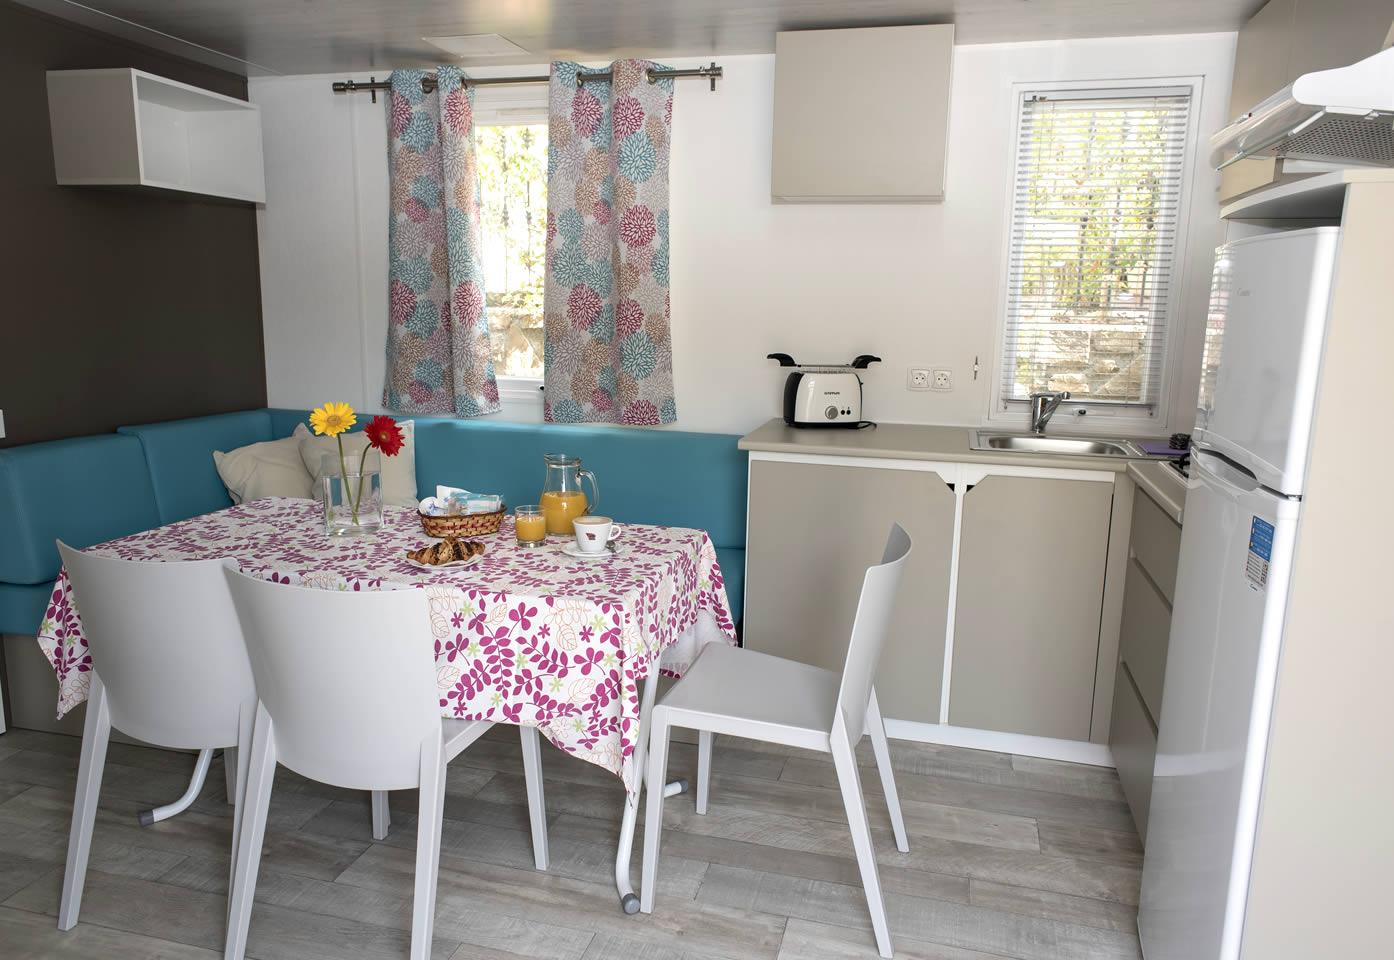 Liguri bungalow mobil homes diano marina camping bloemenriviera mobile homes liguria - Kitchenette met stoelen ...